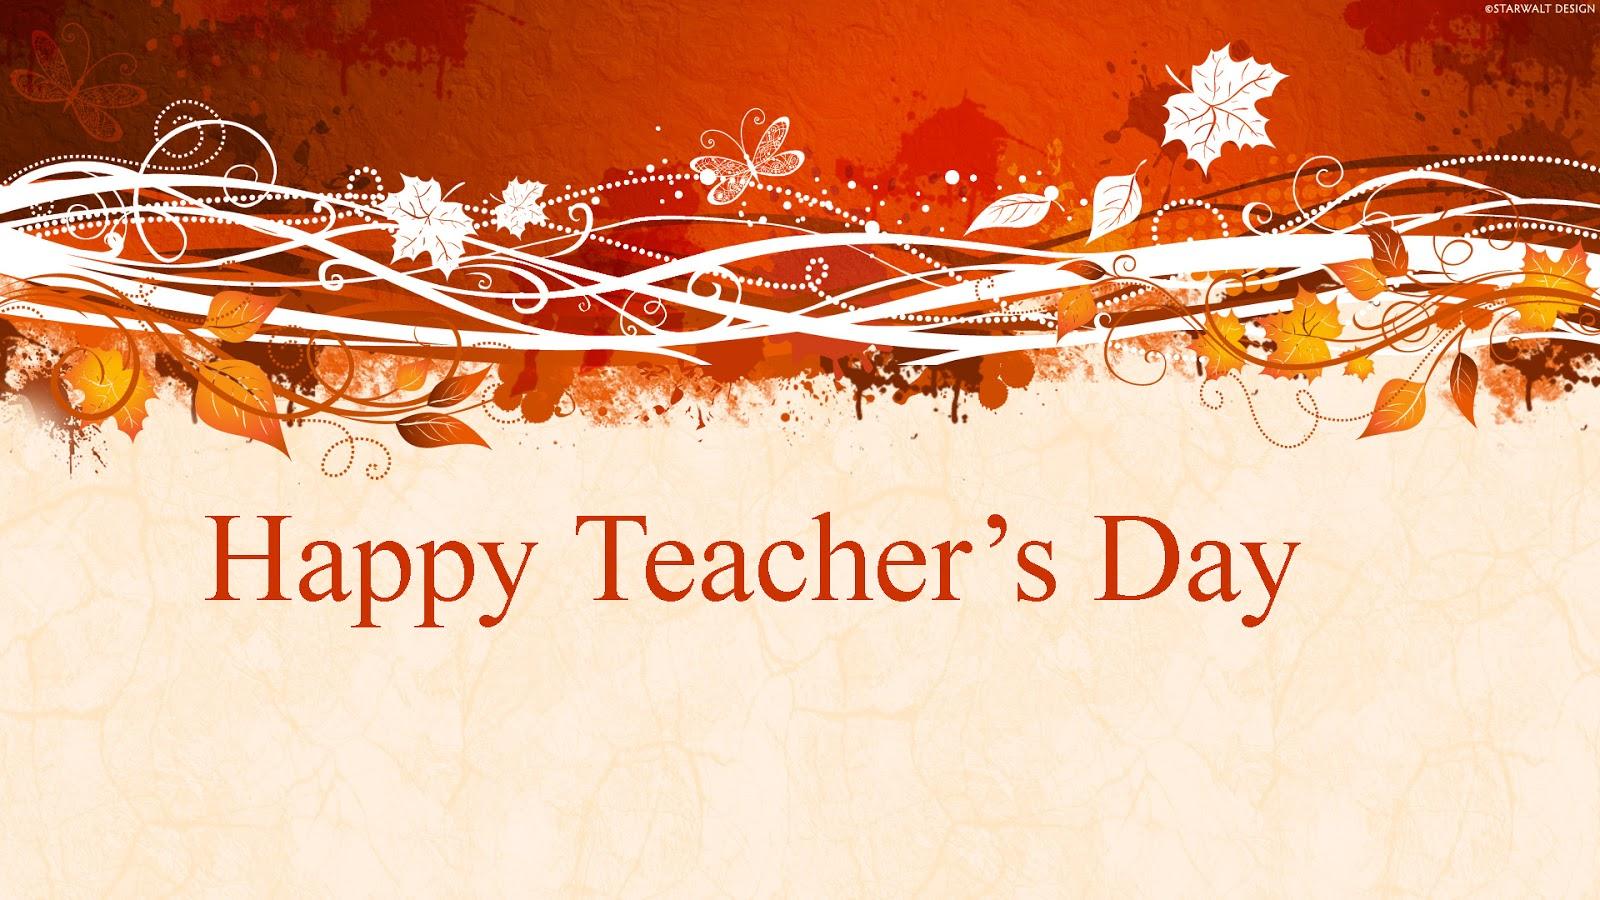 com teachers day  teachers day